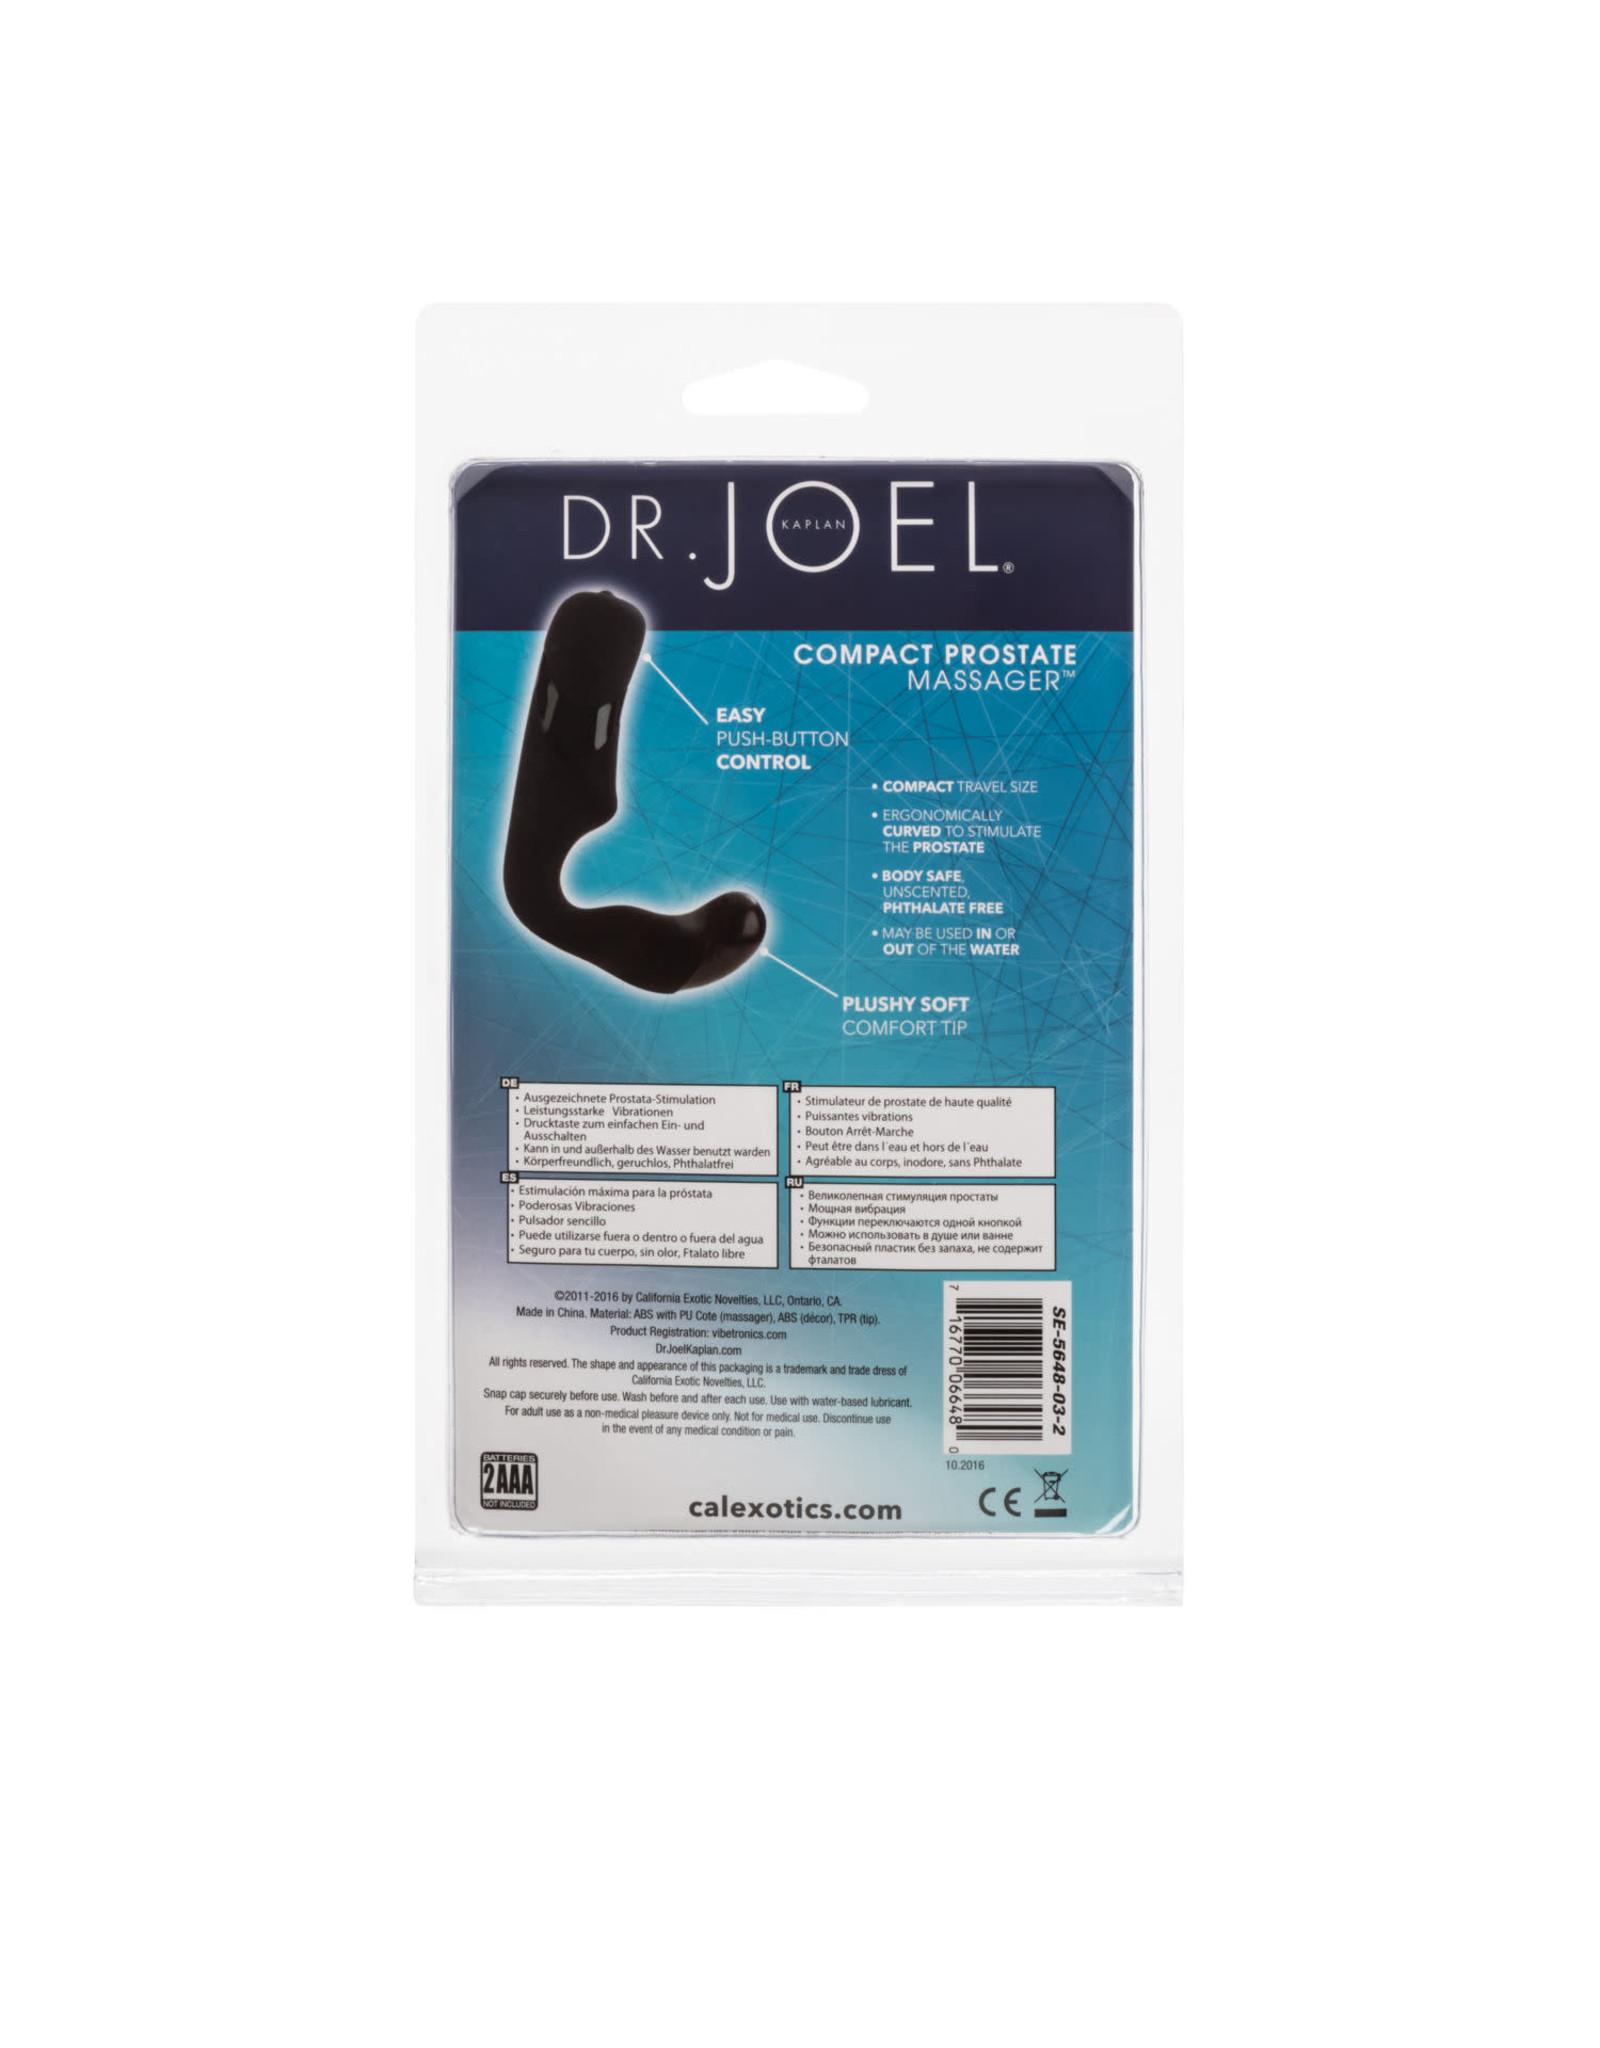 DR JOEL - COMPACT PROSTATE MASSAGER